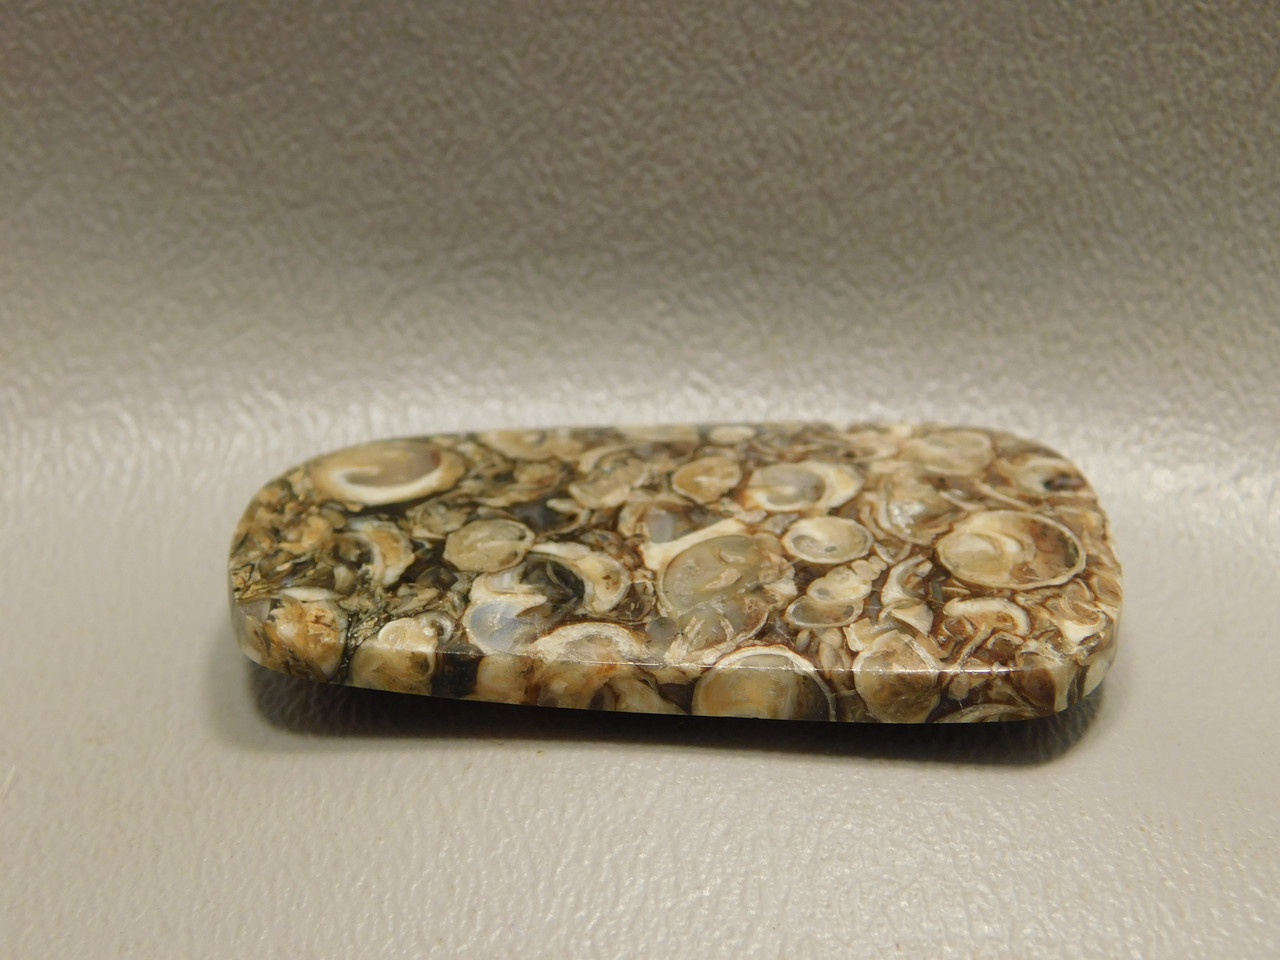 Turritella Agate Miocene Fossil Cabochon Jewelry Making Supplies #7